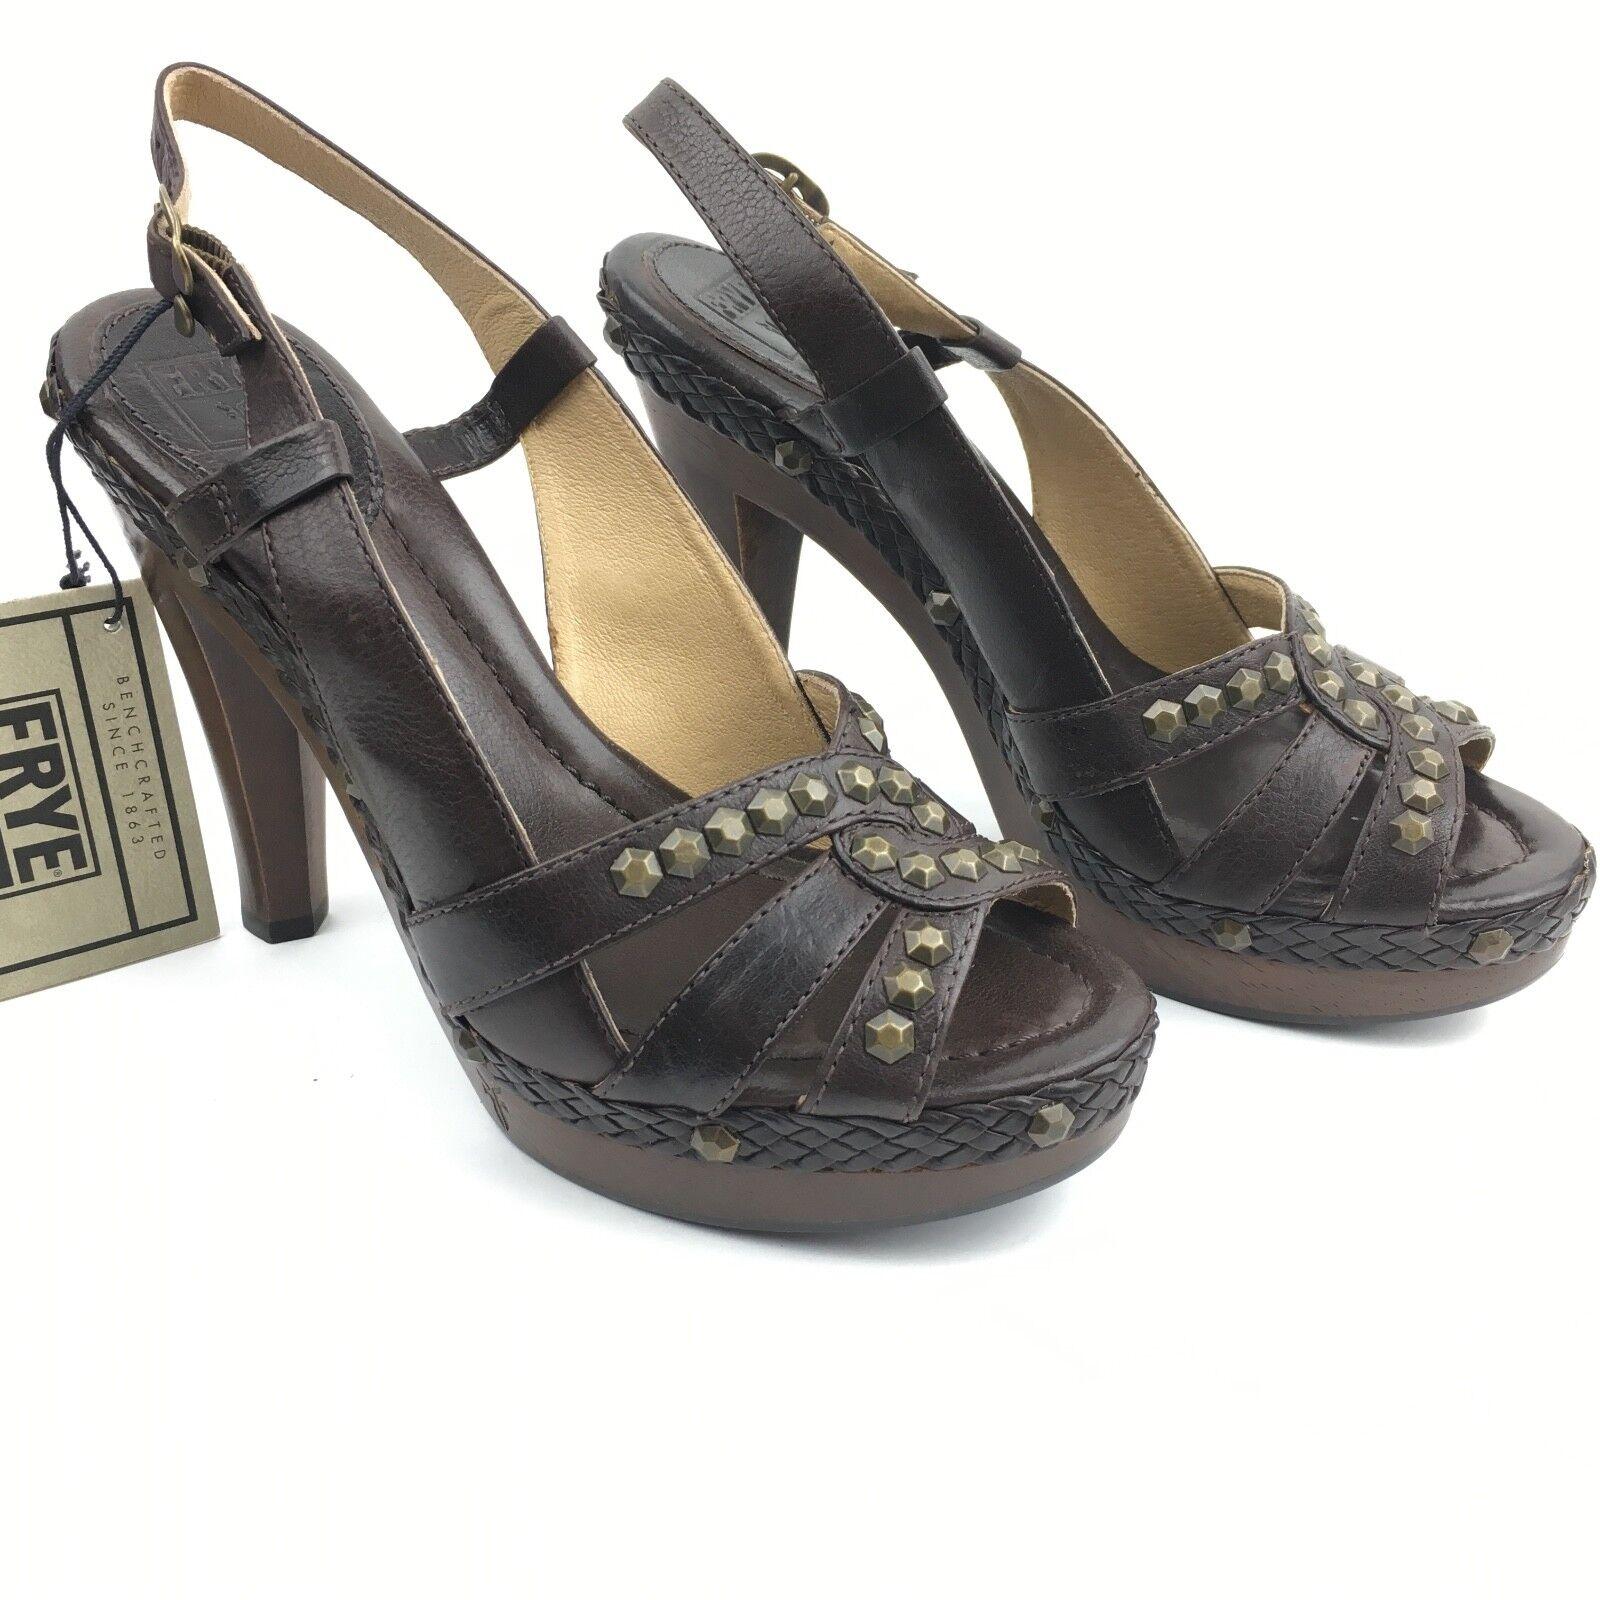 Frye Dara Honeycomb Leather Studded Slingback Heels Dark Brown Size 9